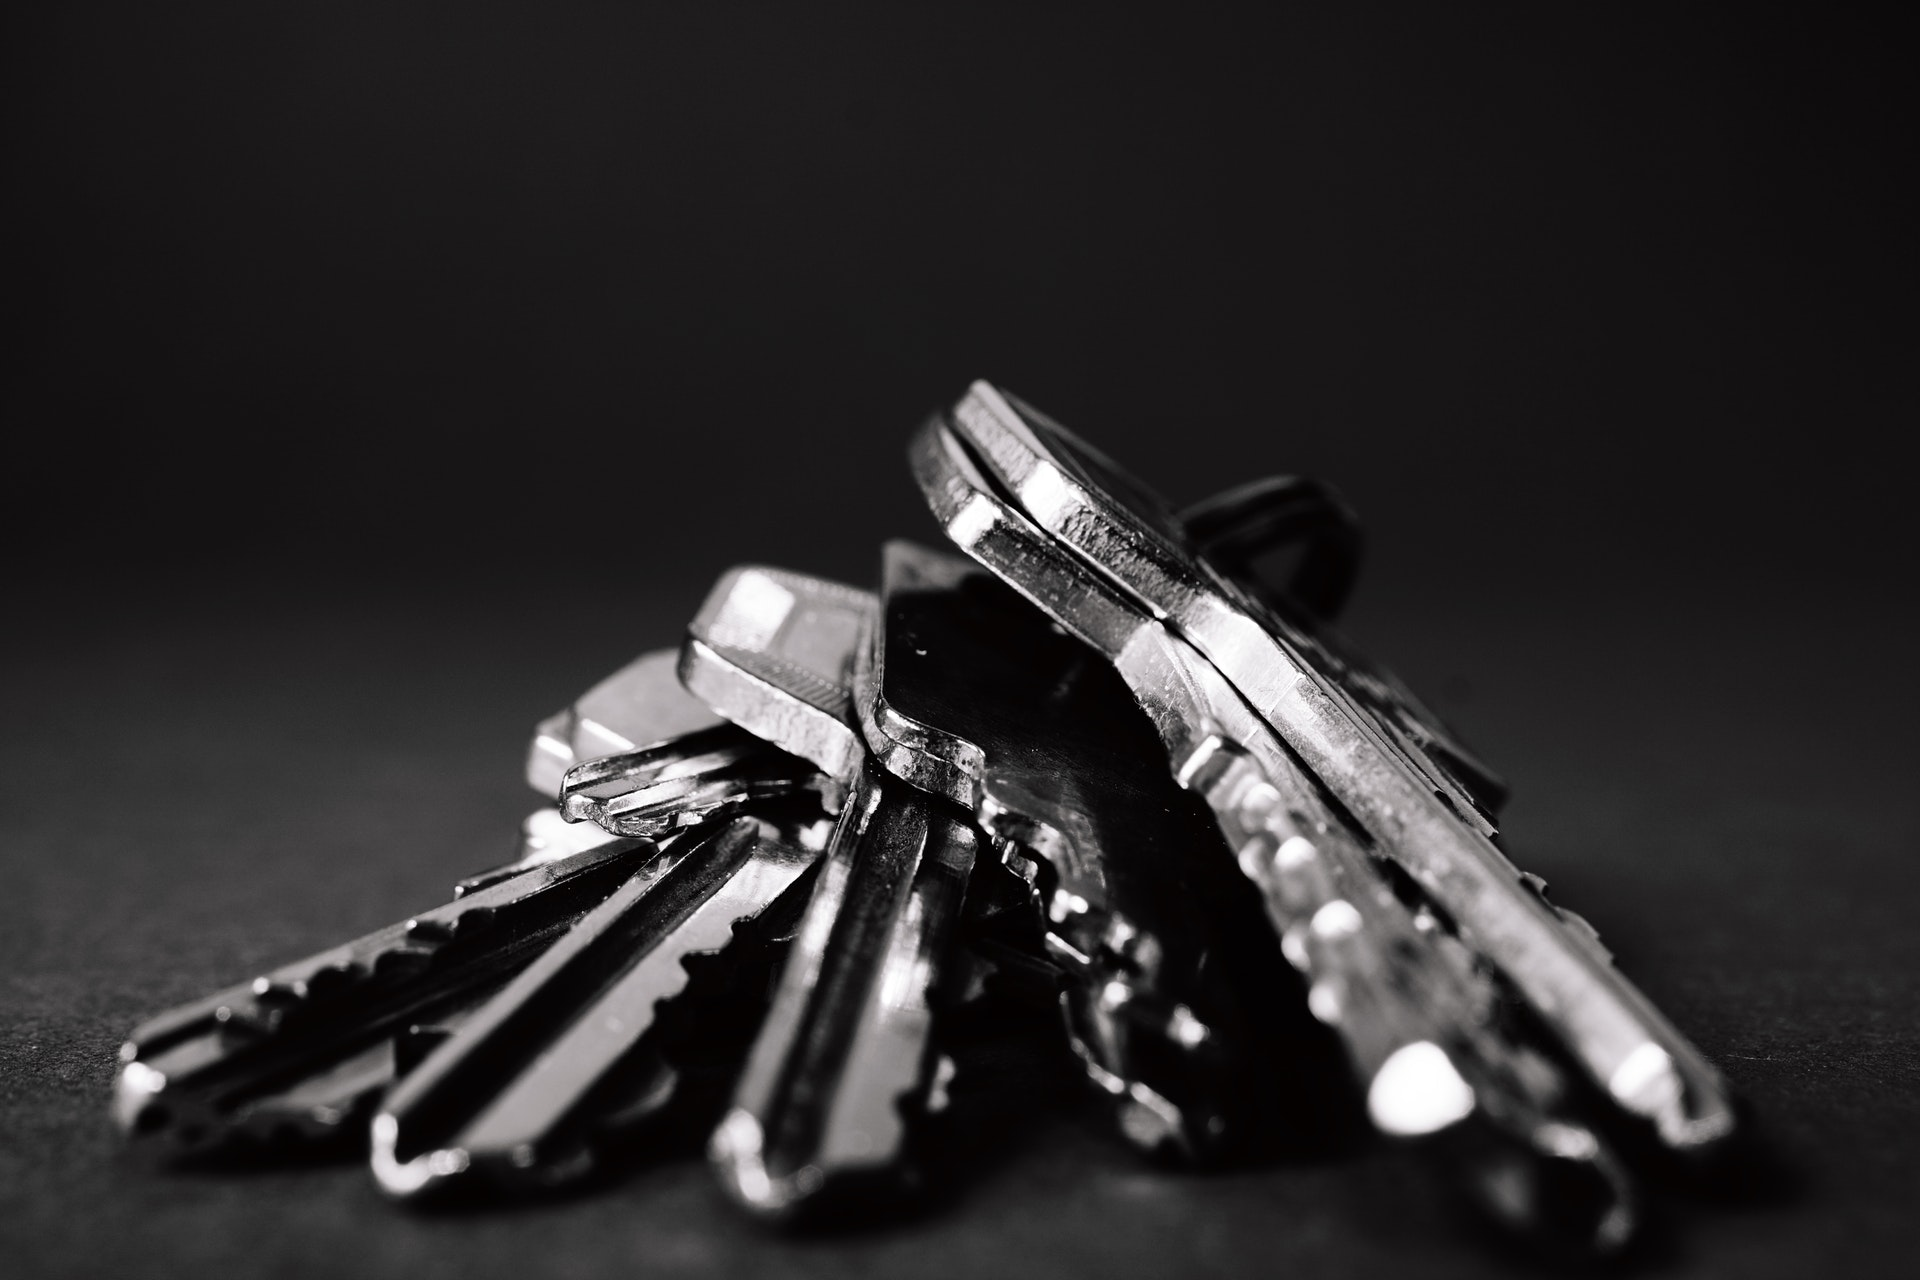 close-up-of-keys-333837